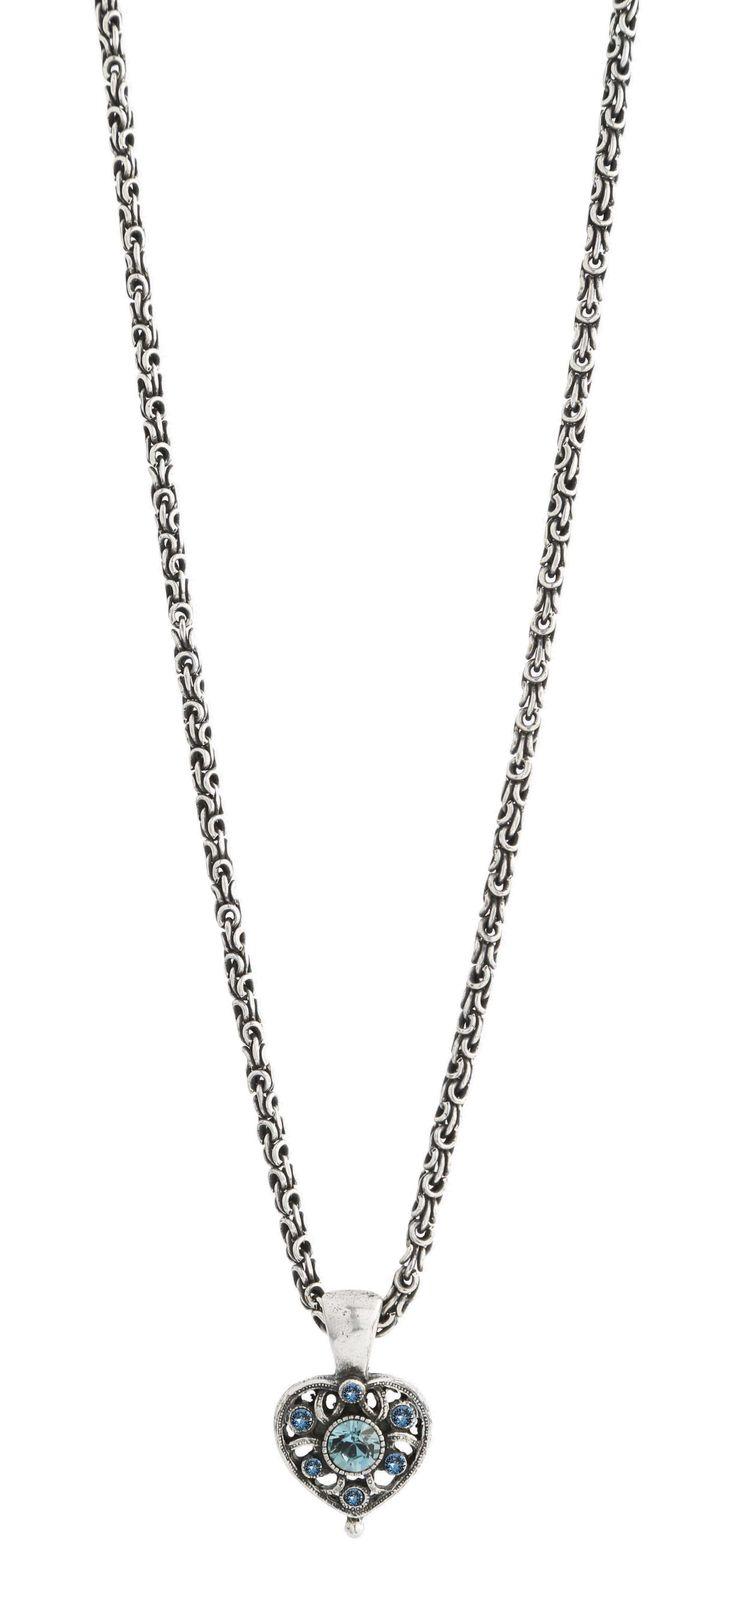 N1463 necklace - AU$39 with  EN1085 enhancer - AU$39